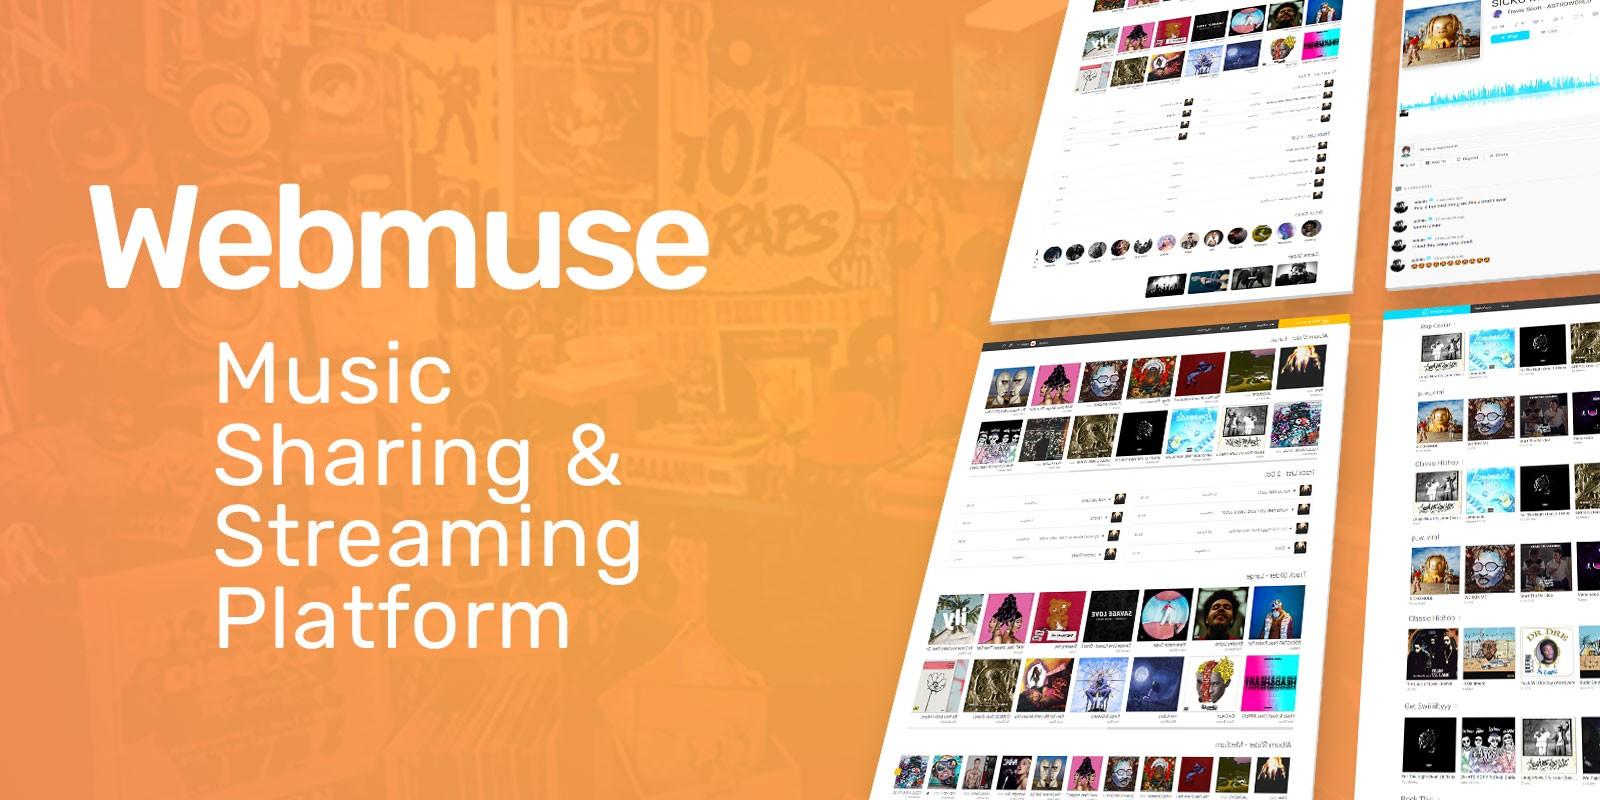 Webmuse - Music Sharing Platform